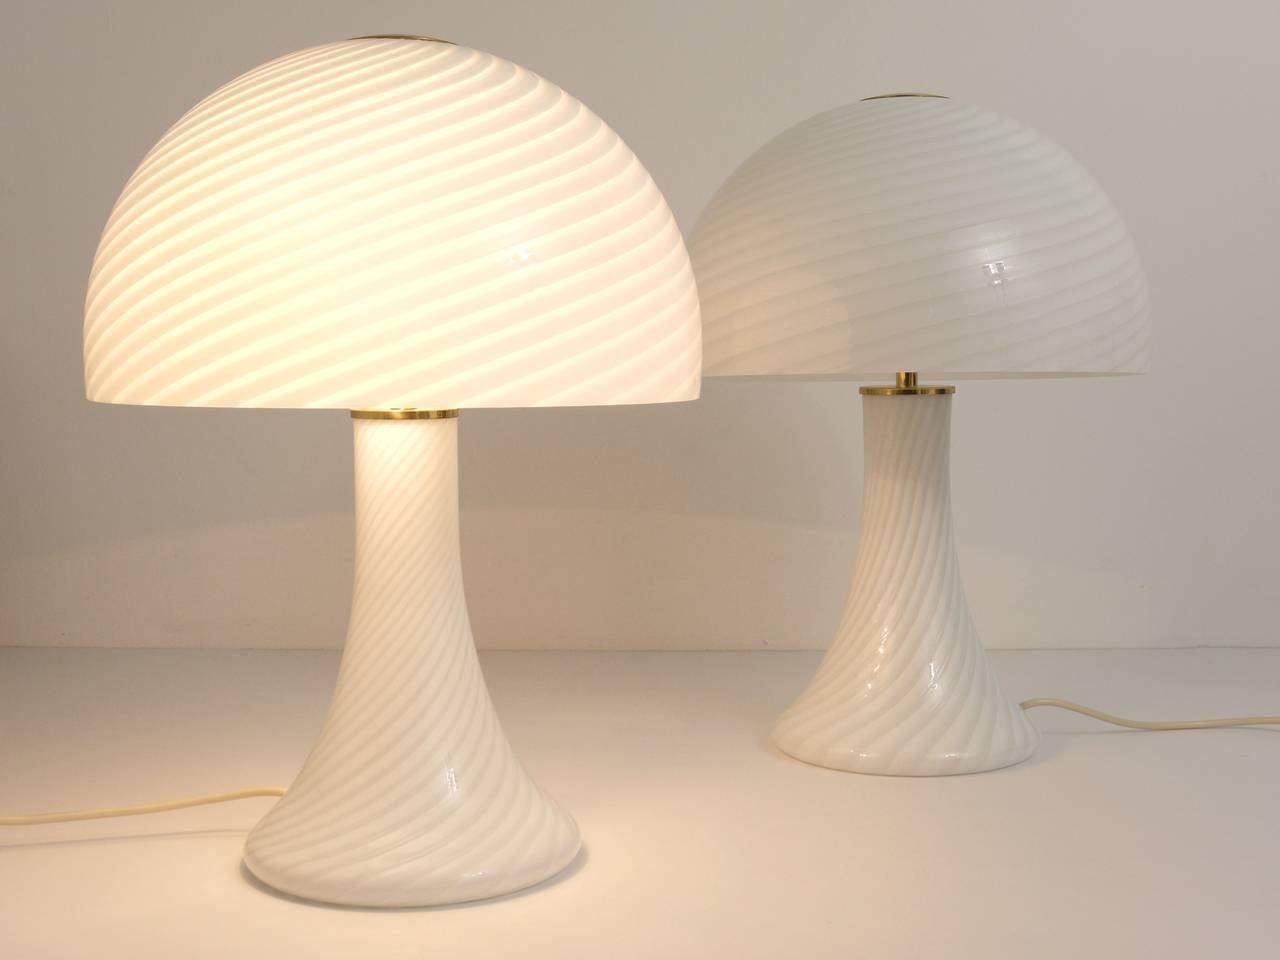 Mid-Century Modern Pair of Kalmar Murano Glass and Brass Mushroom Lamps by Vistosi, 1960s For Sale